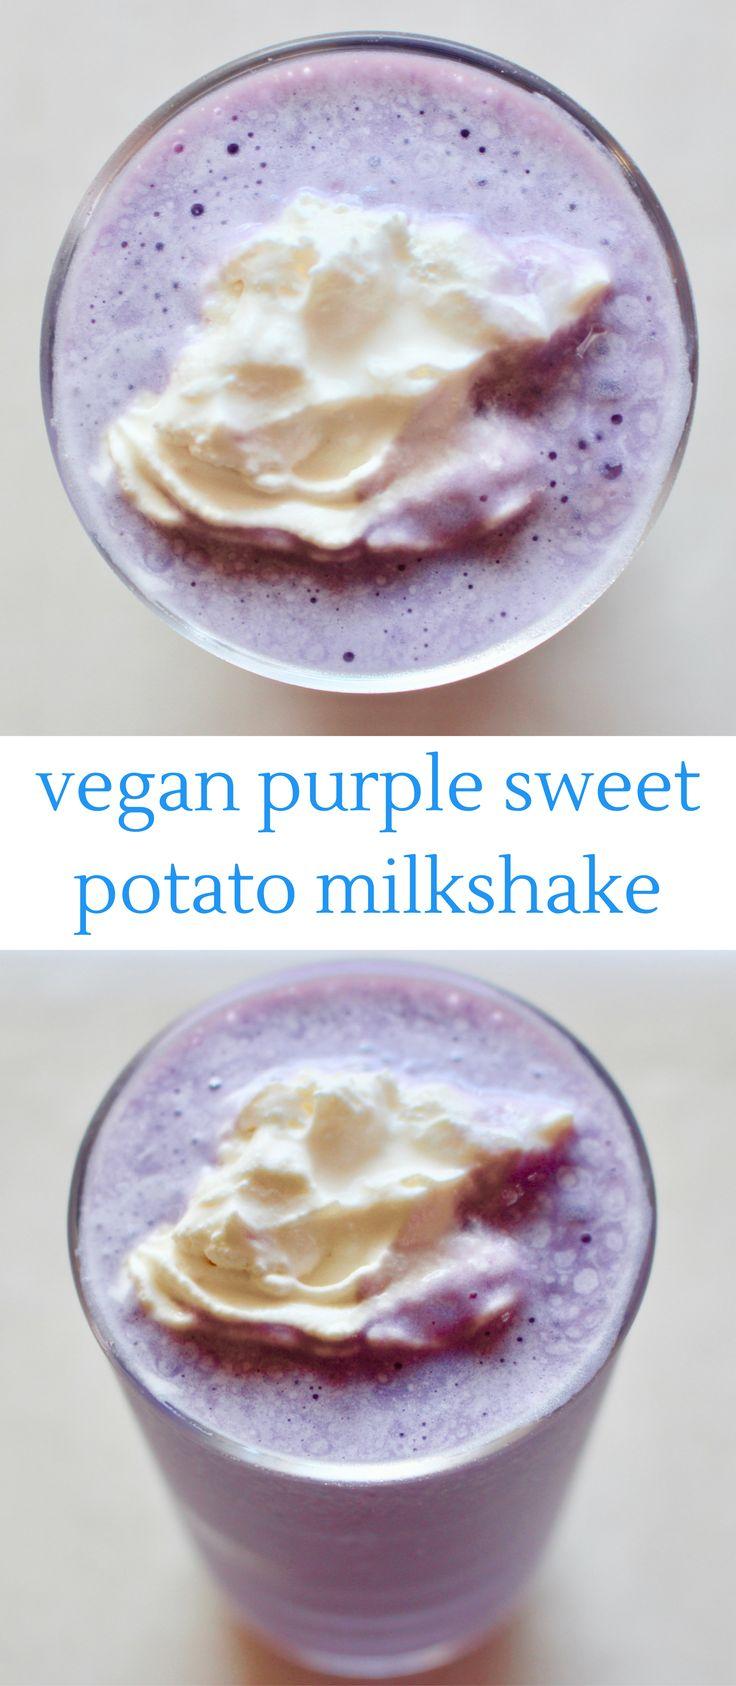 Purple Sweet Potato Milkshake - vegan, gluten-free and refined sugar free.